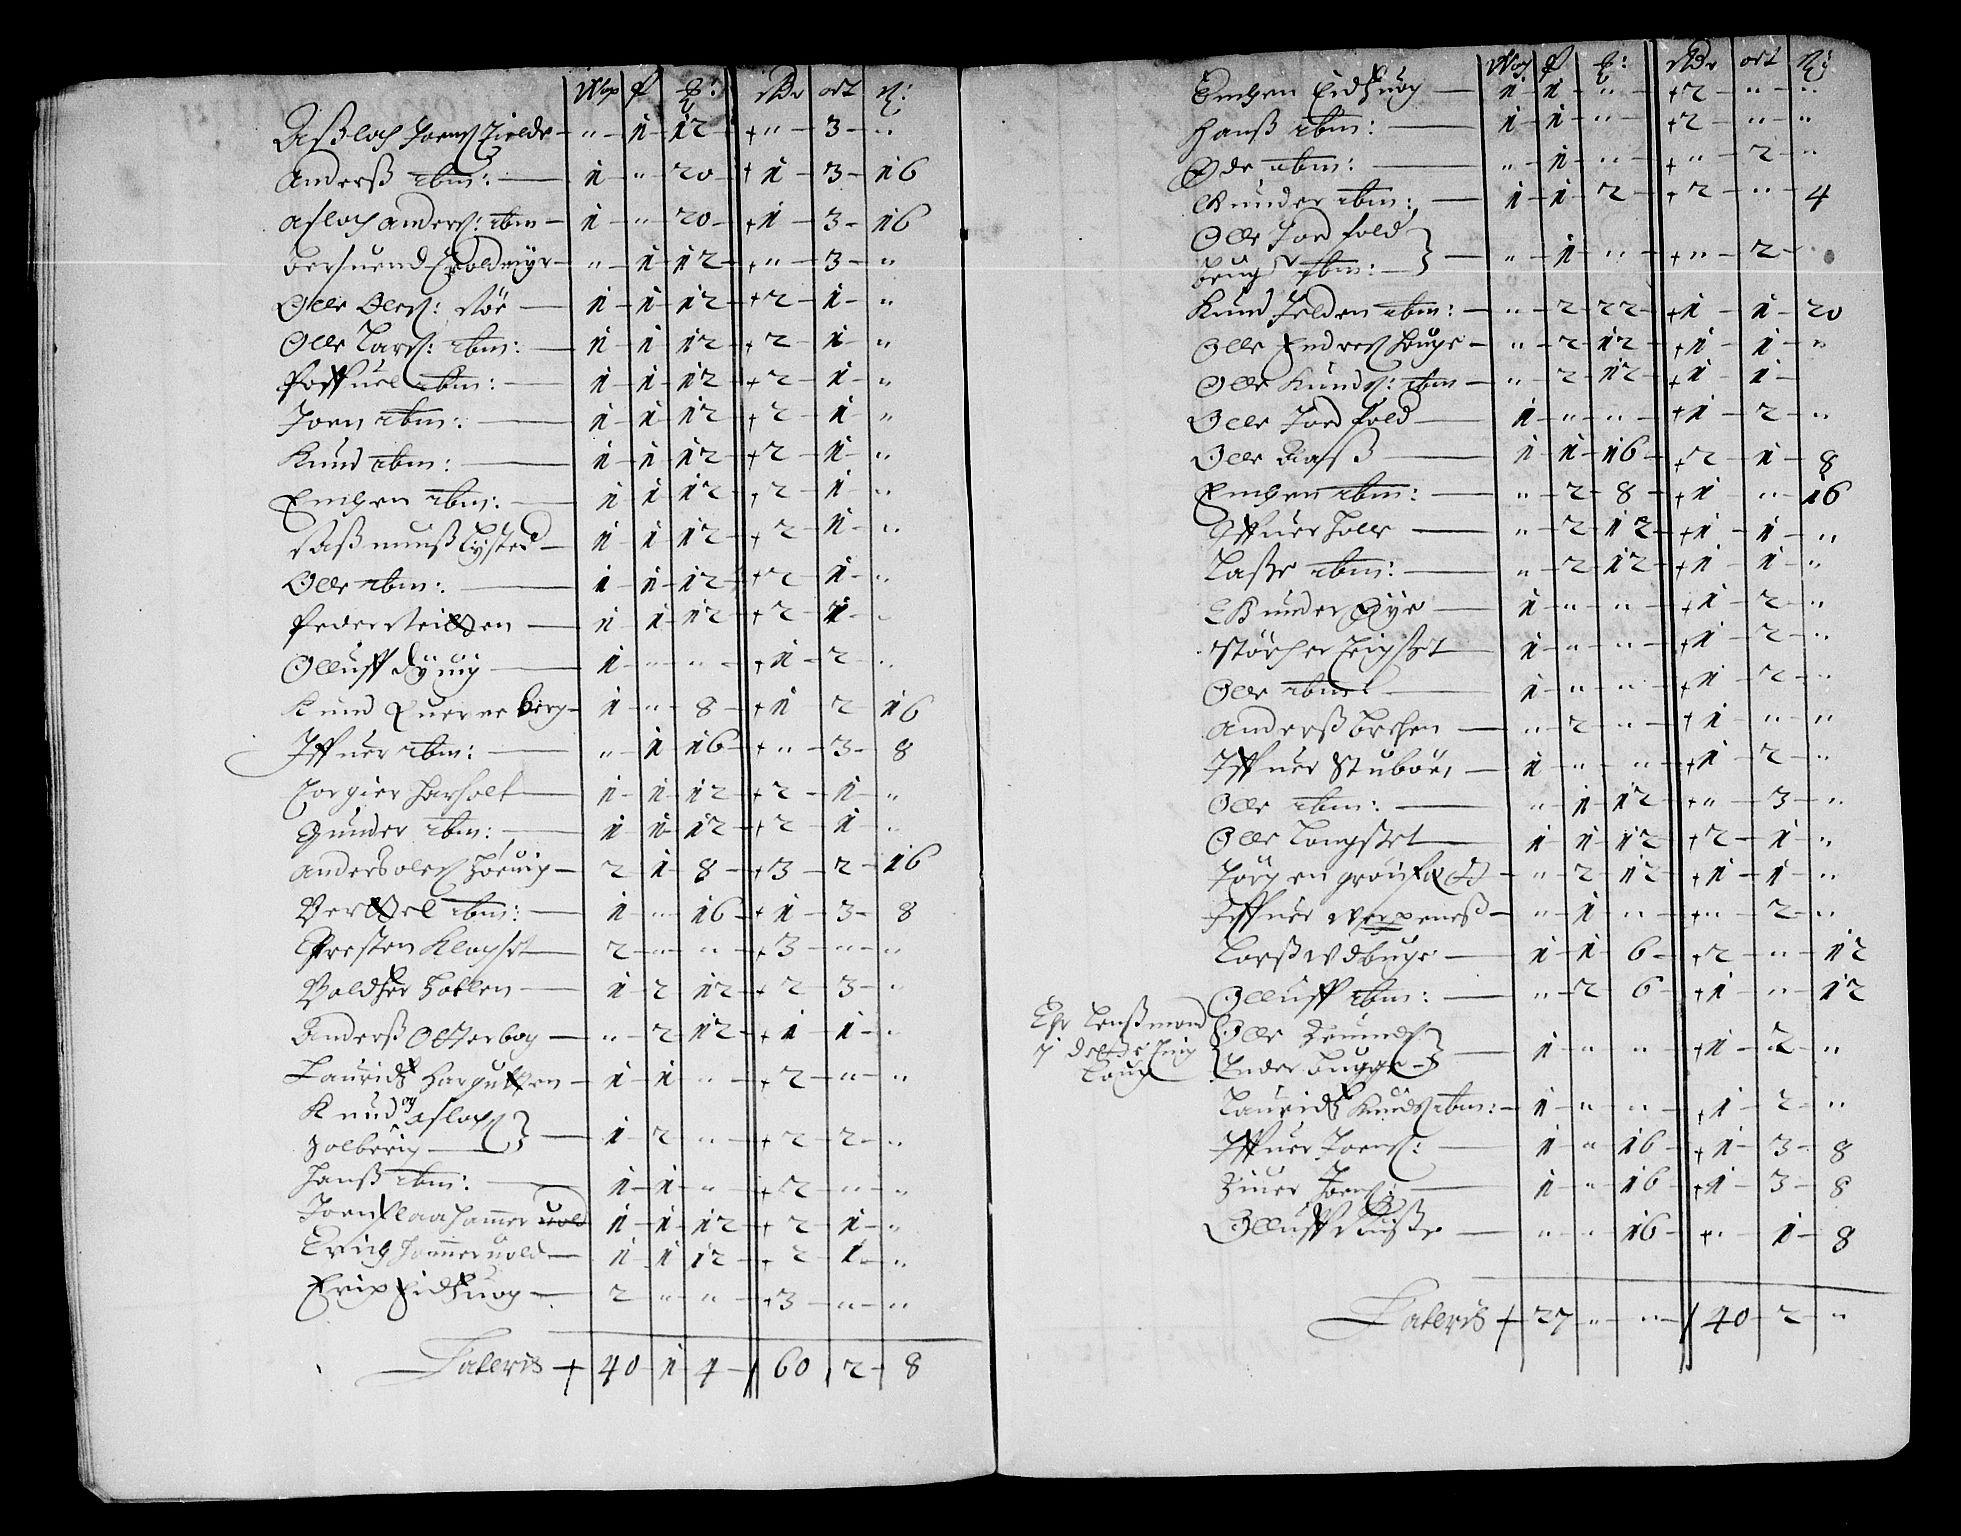 RA, Rentekammeret inntil 1814, Reviderte regnskaper, Stiftamtstueregnskaper, Trondheim stiftamt og Nordland amt, R/Re/L0048: Trondheim stiftamt og Nordland amt, 1677